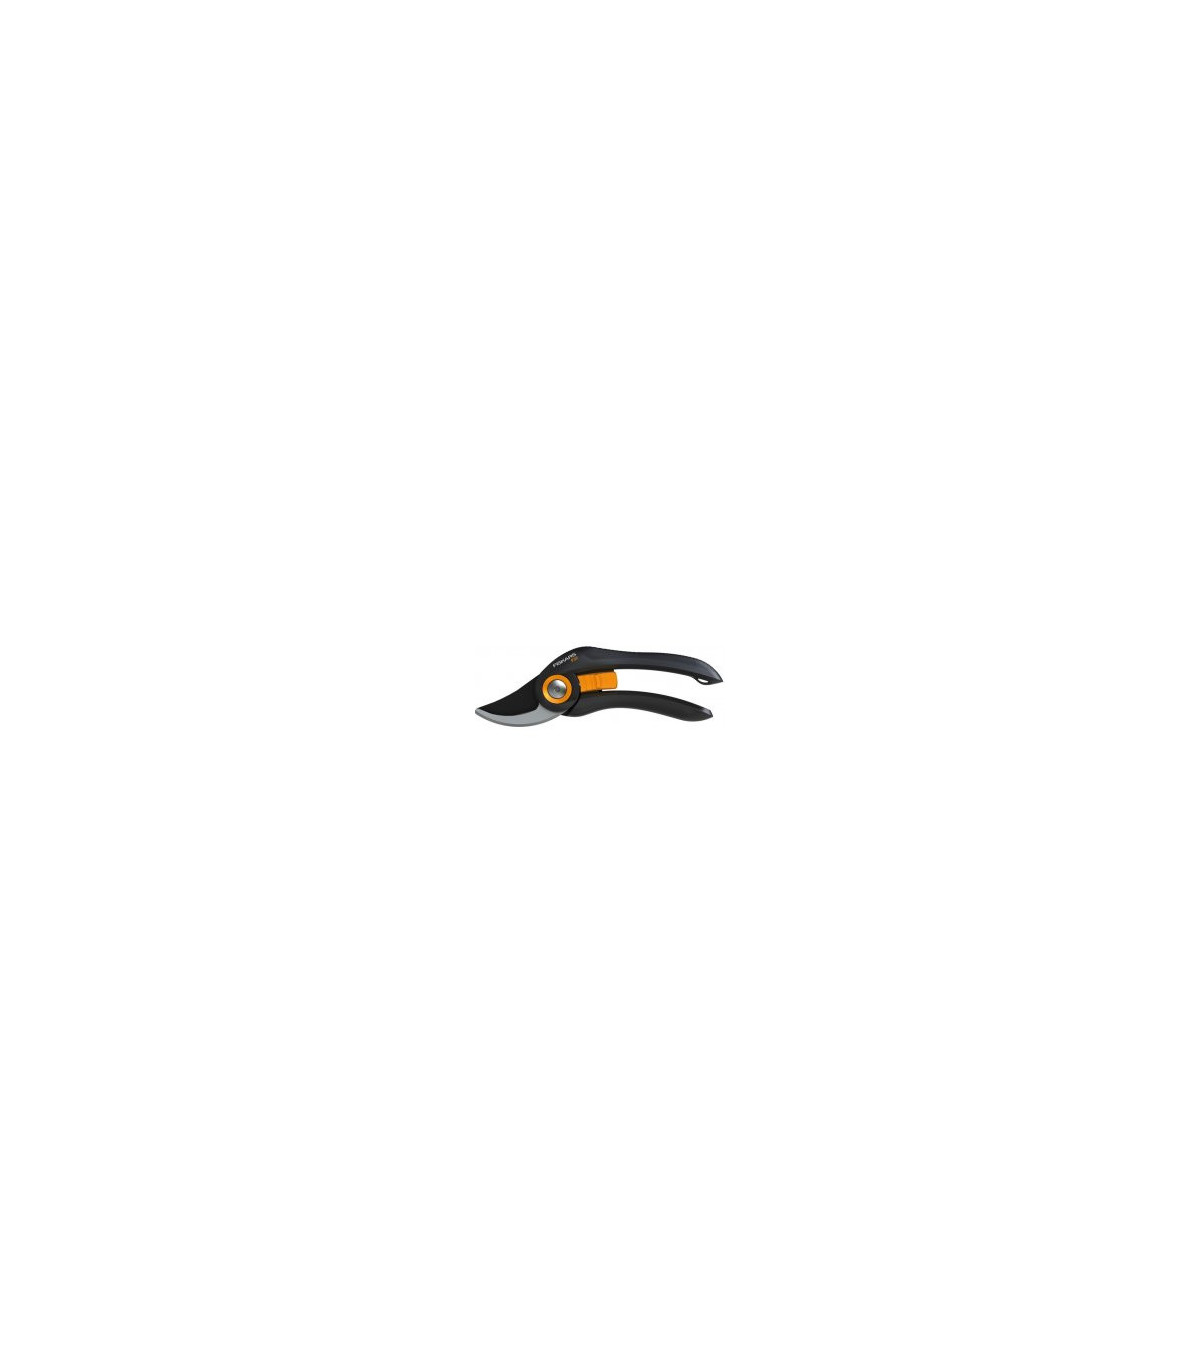 Nožnice dvojsečné Solid - černé - Fiskars - 1 ks